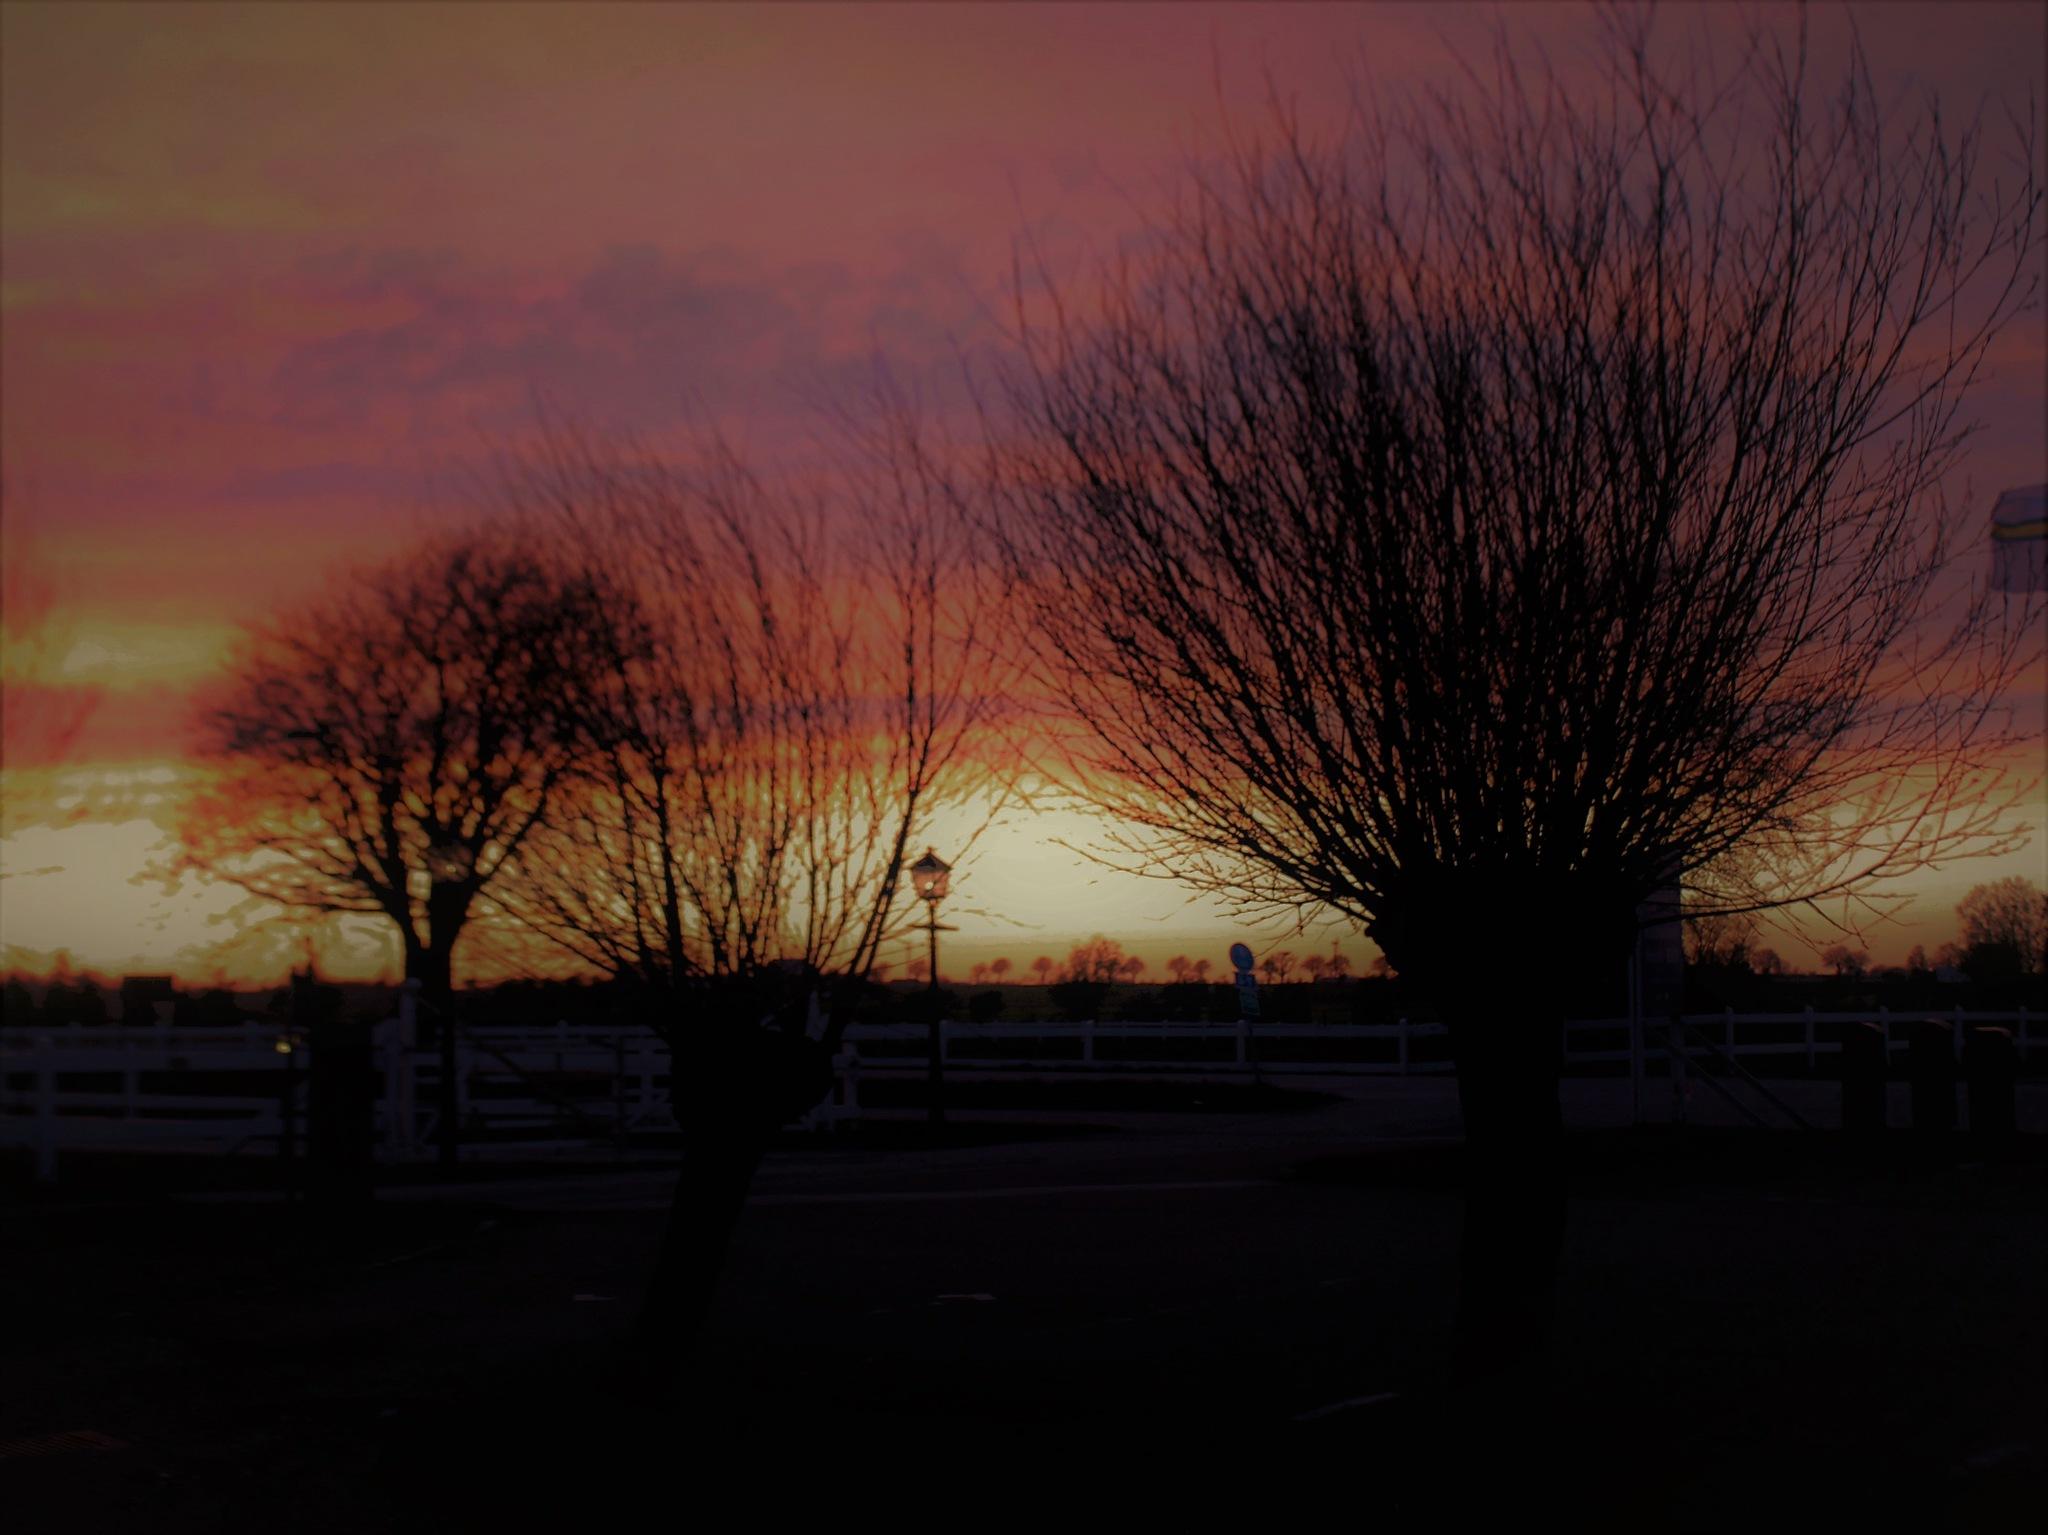 Evening Sunset I. by KerstinP.